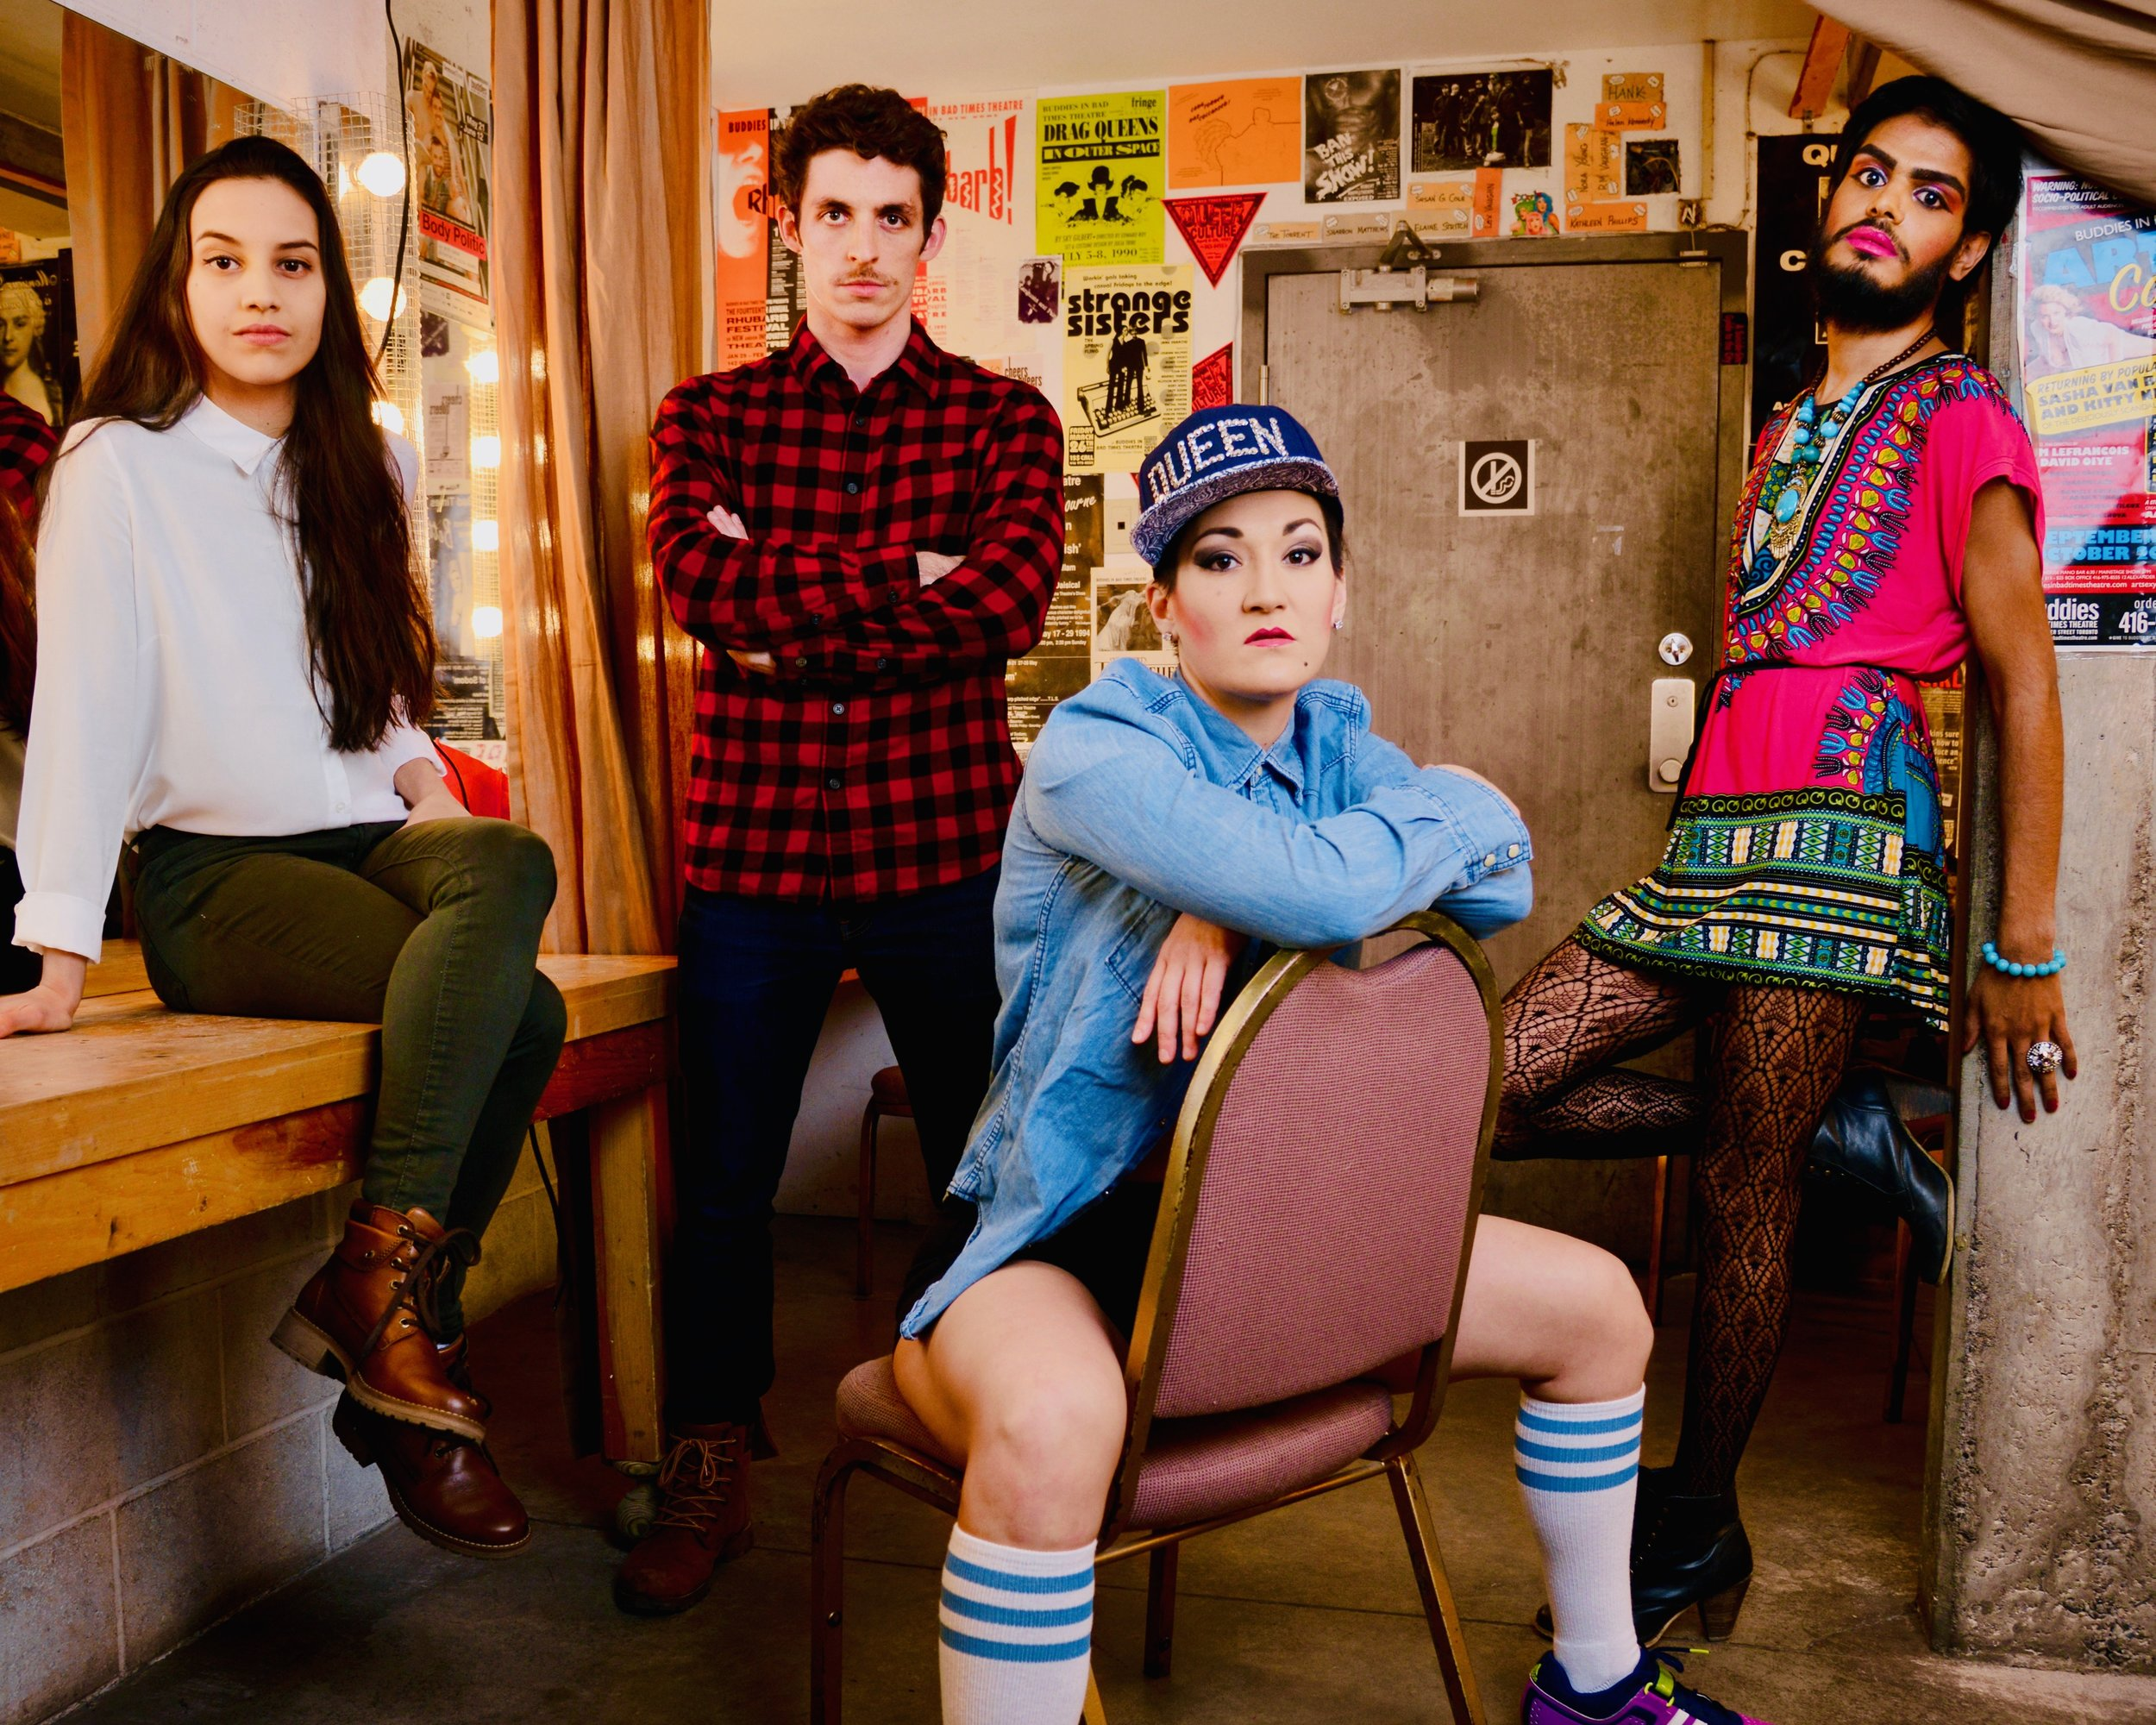 Queer AF Collective: (L-R) Sofía Rodríguez, François Macdonald, Teiya Kasahara, Bilal Baig. Photo Credit: Greg Wong